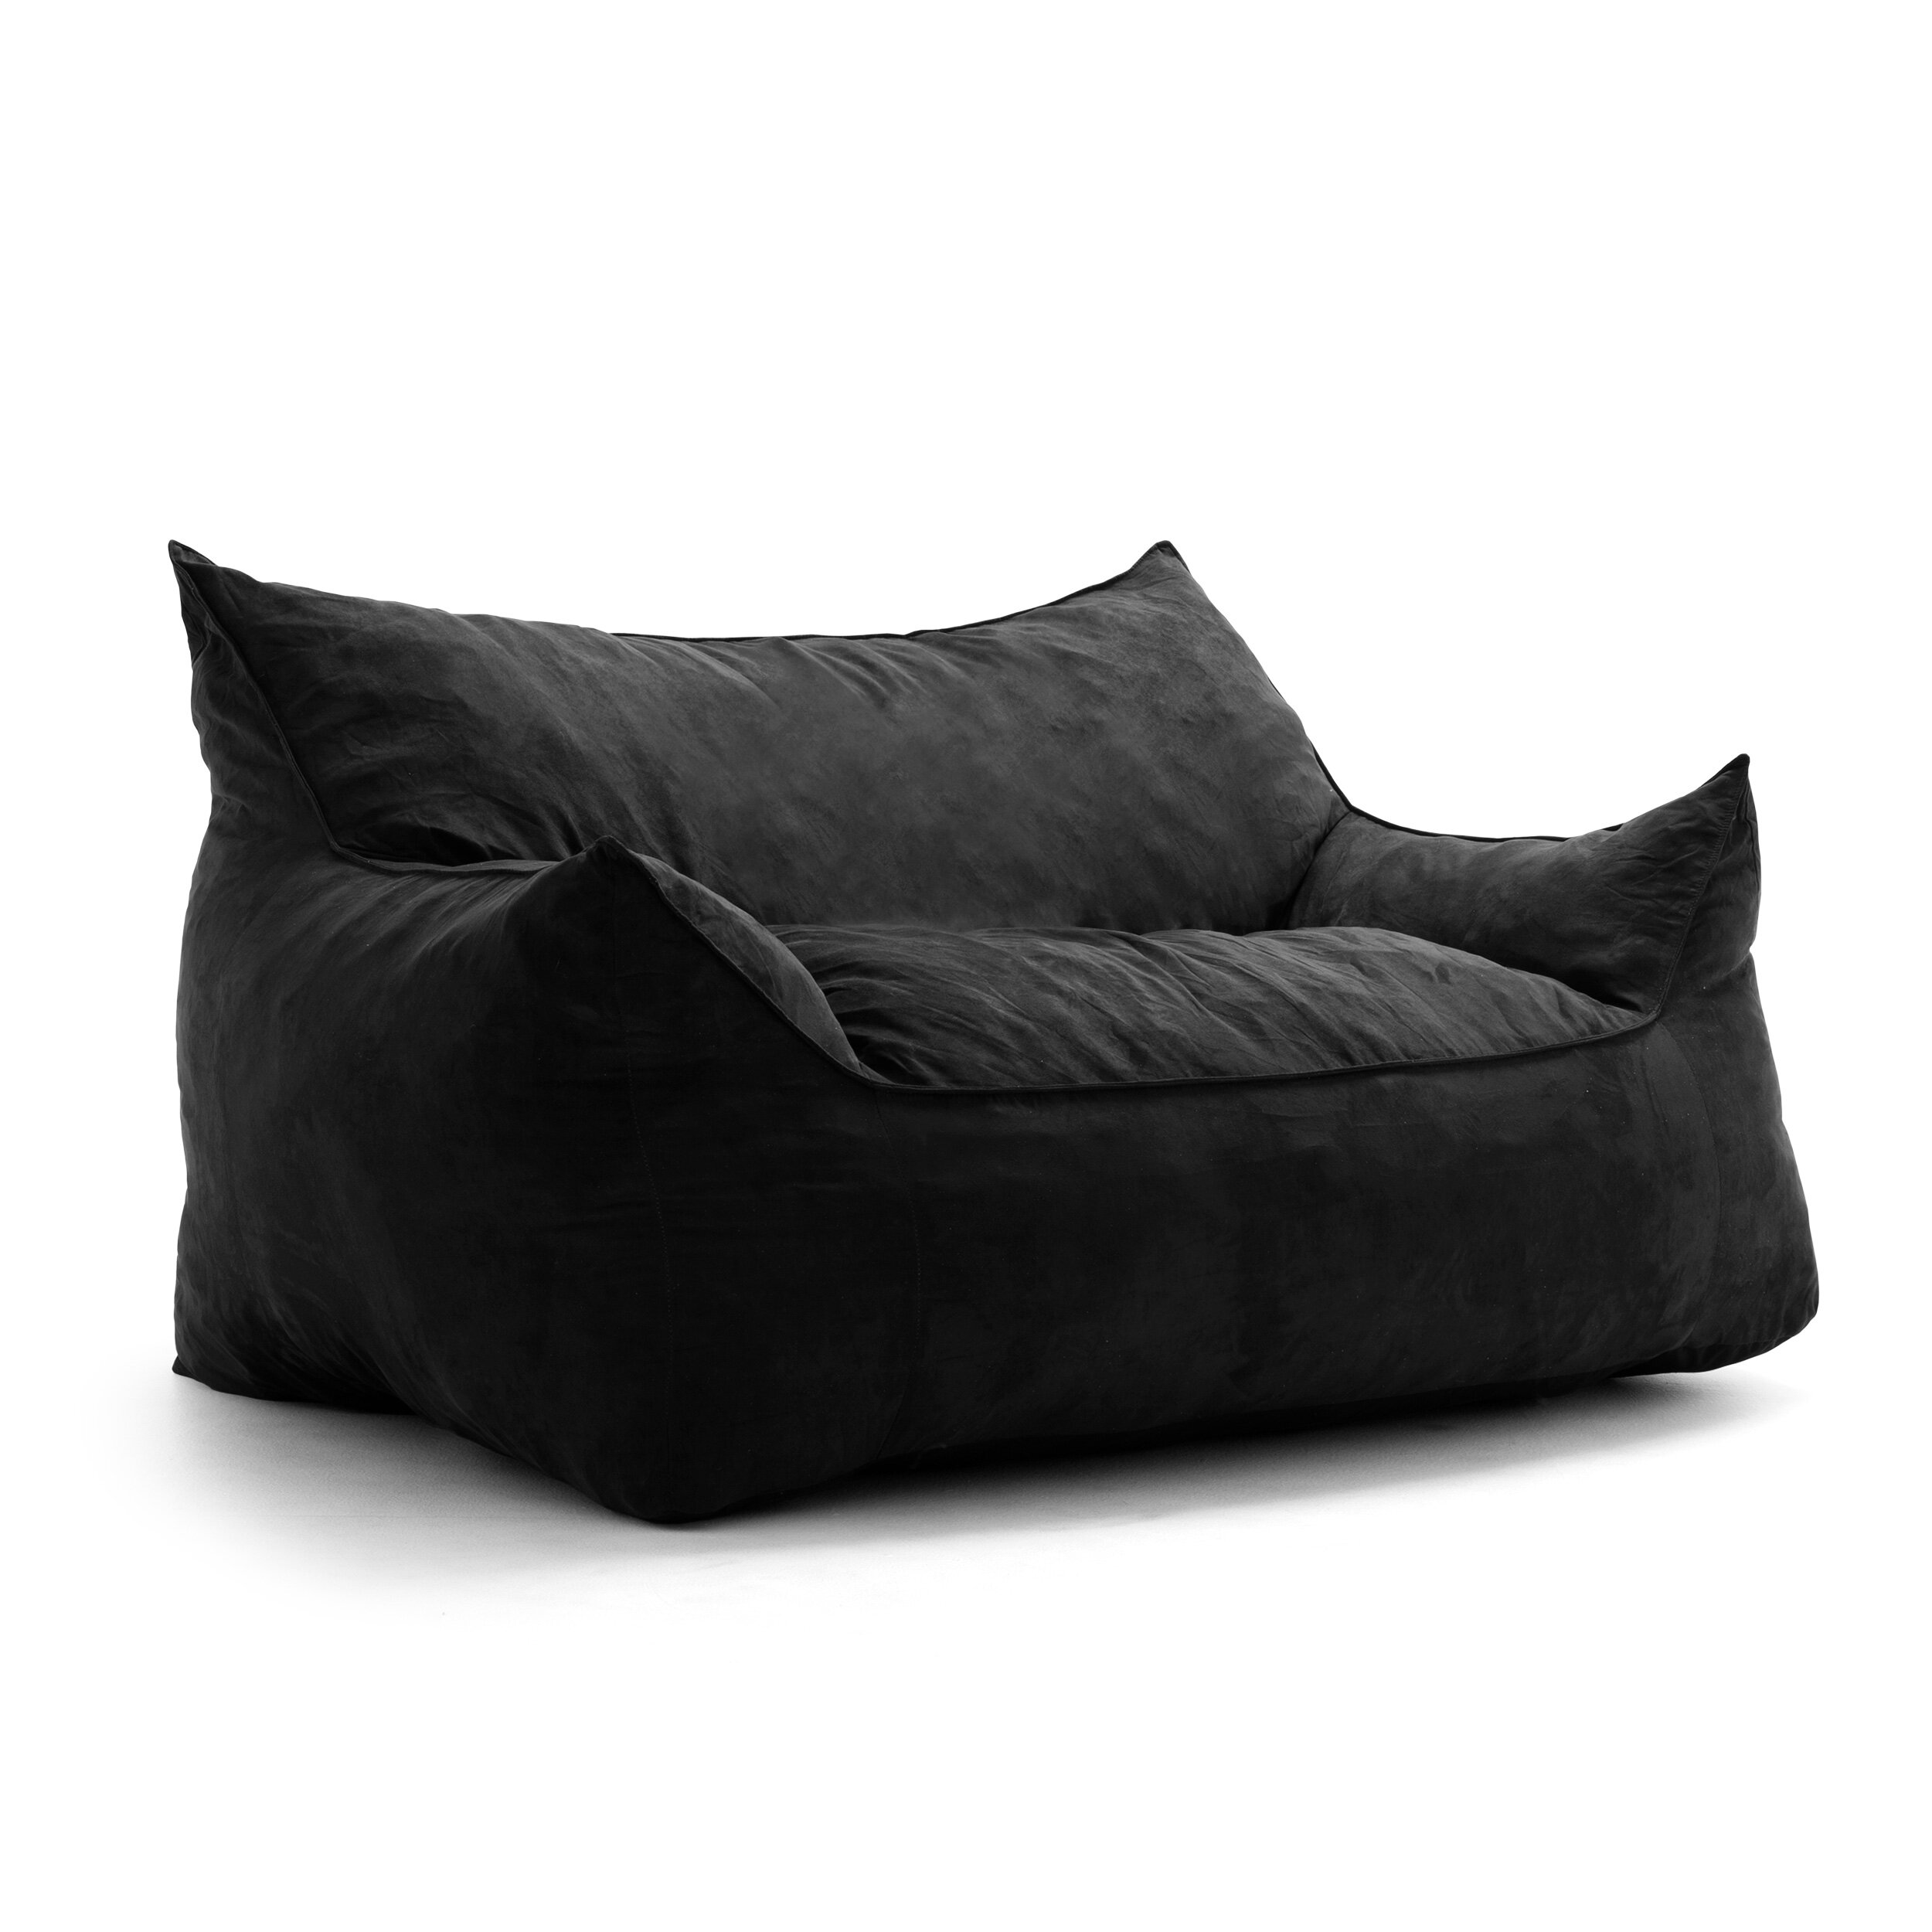 Peachy Extra Large Bean Bag Sofa Beatyapartments Chair Design Images Beatyapartmentscom